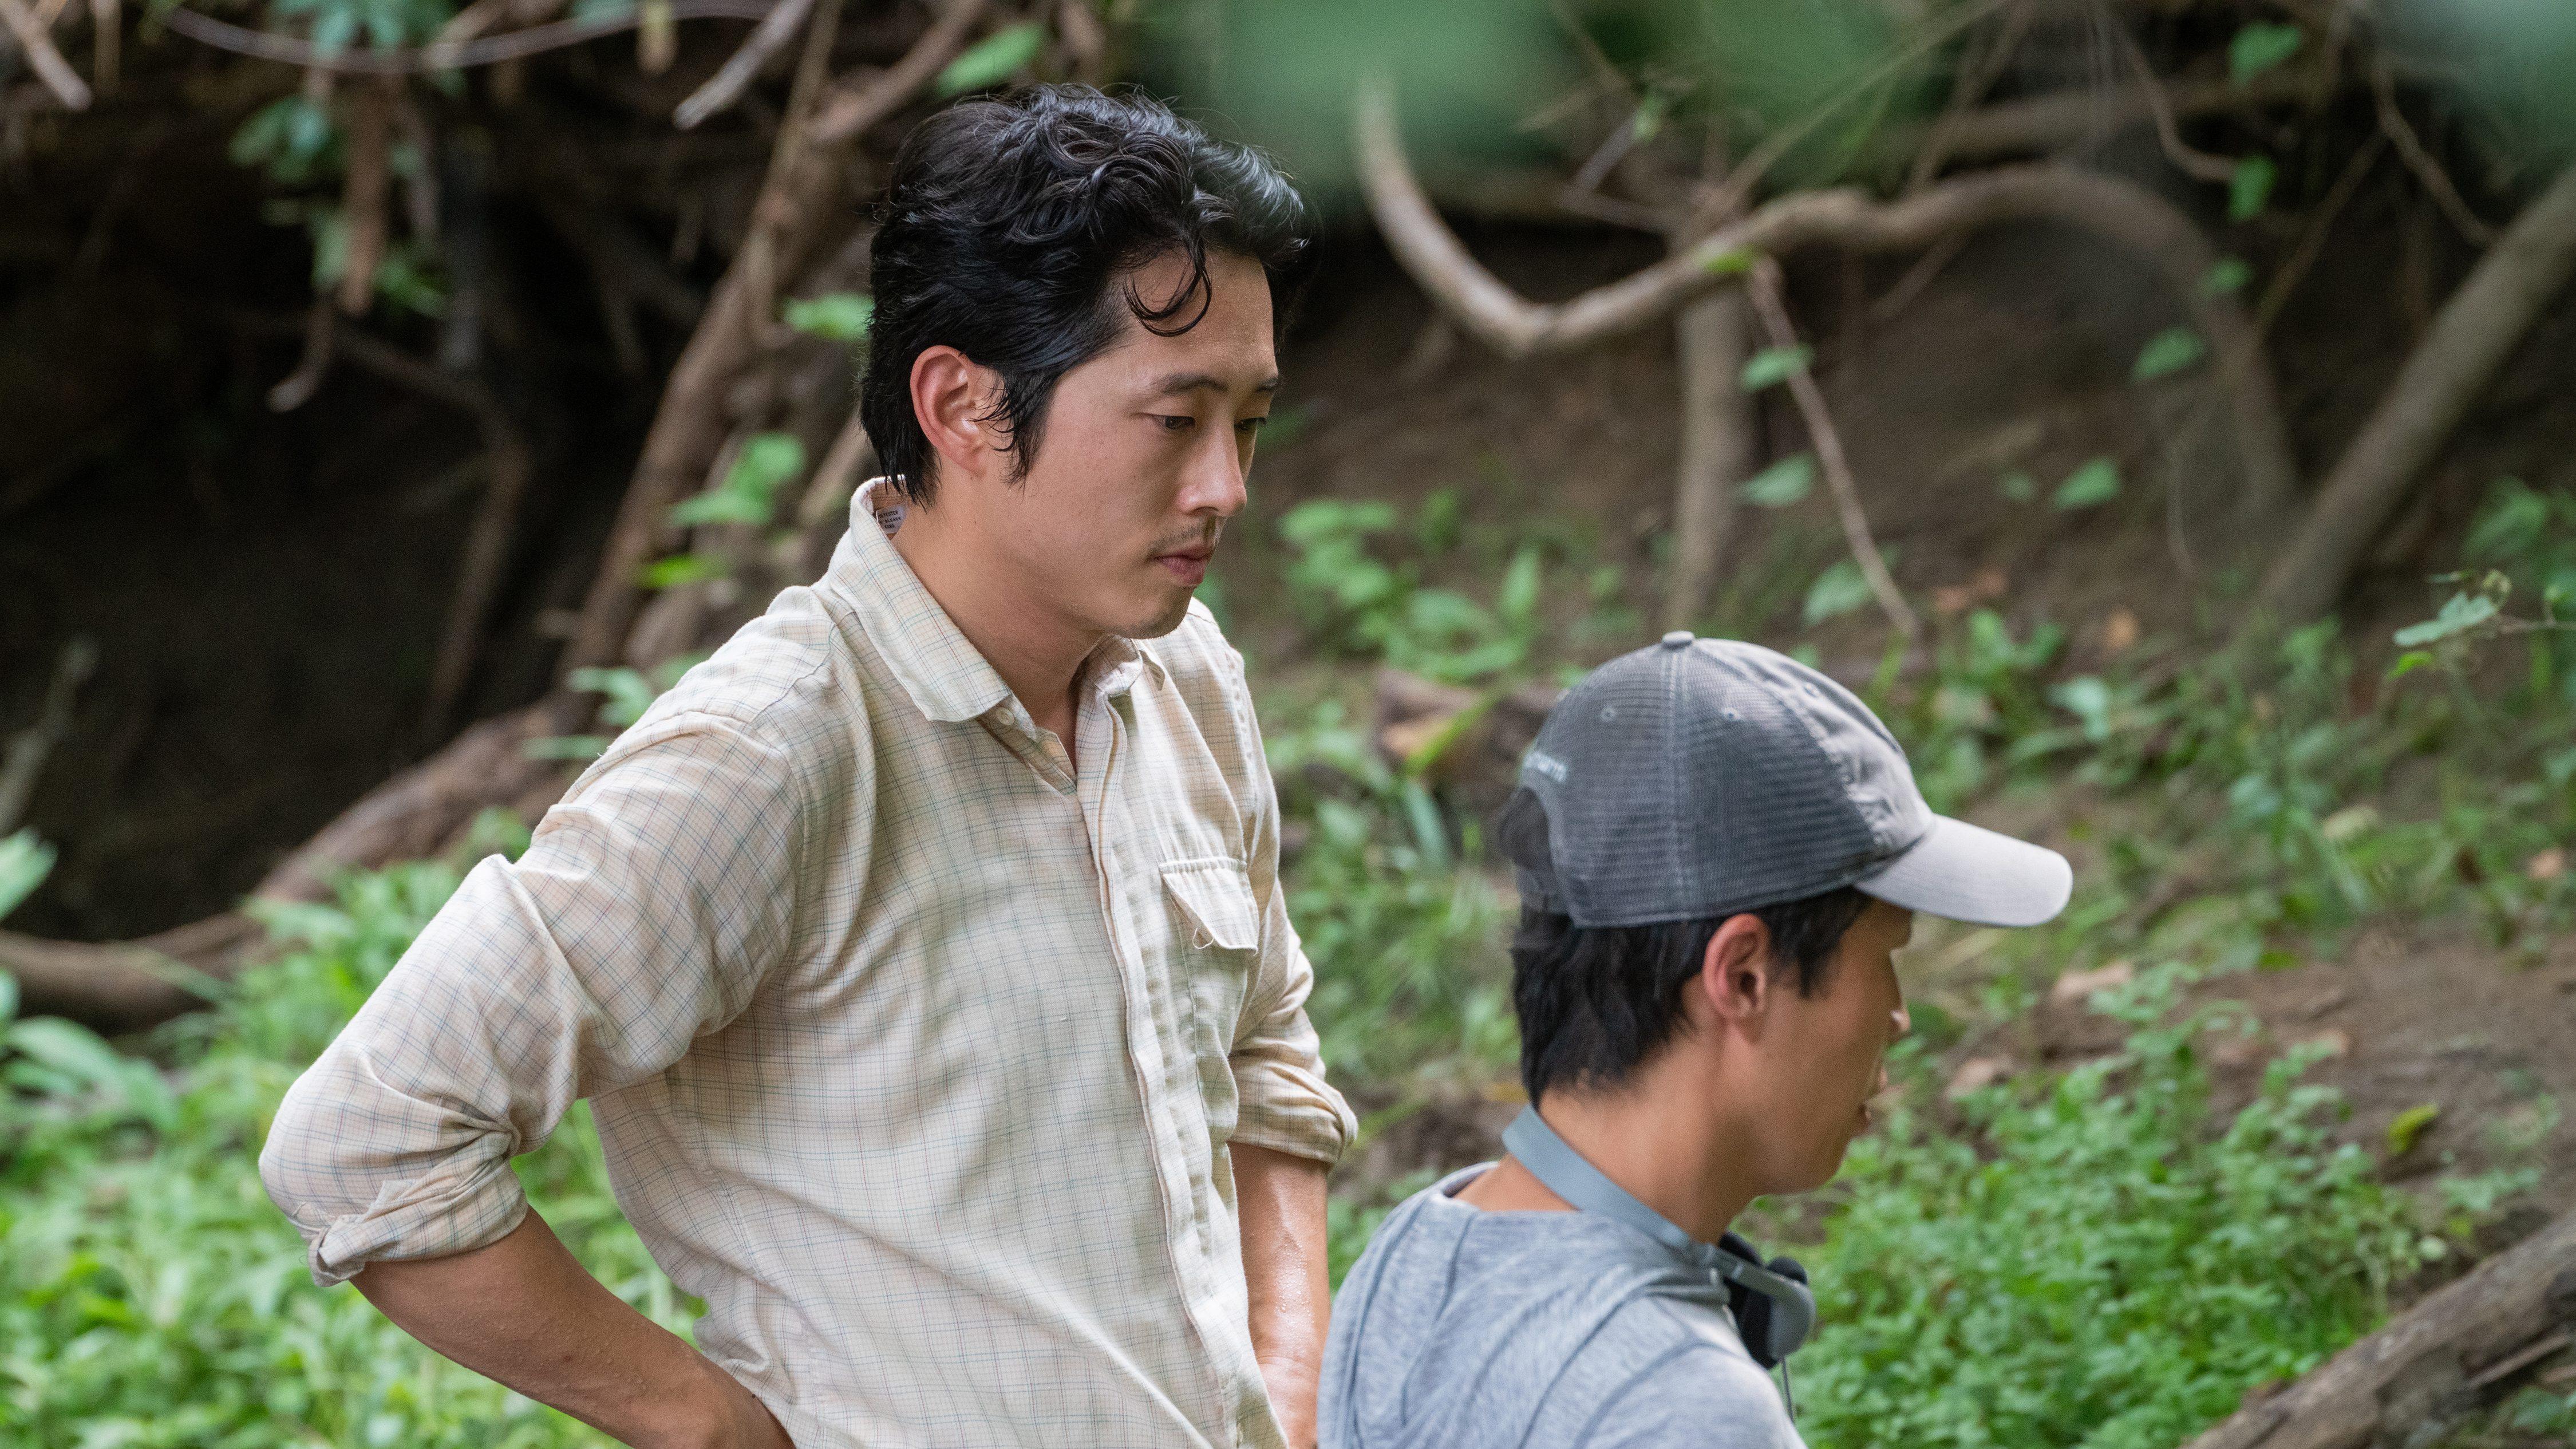 Minari S Steven Yeun And Lee Isaac Chung On Their First Collaboration Deadline